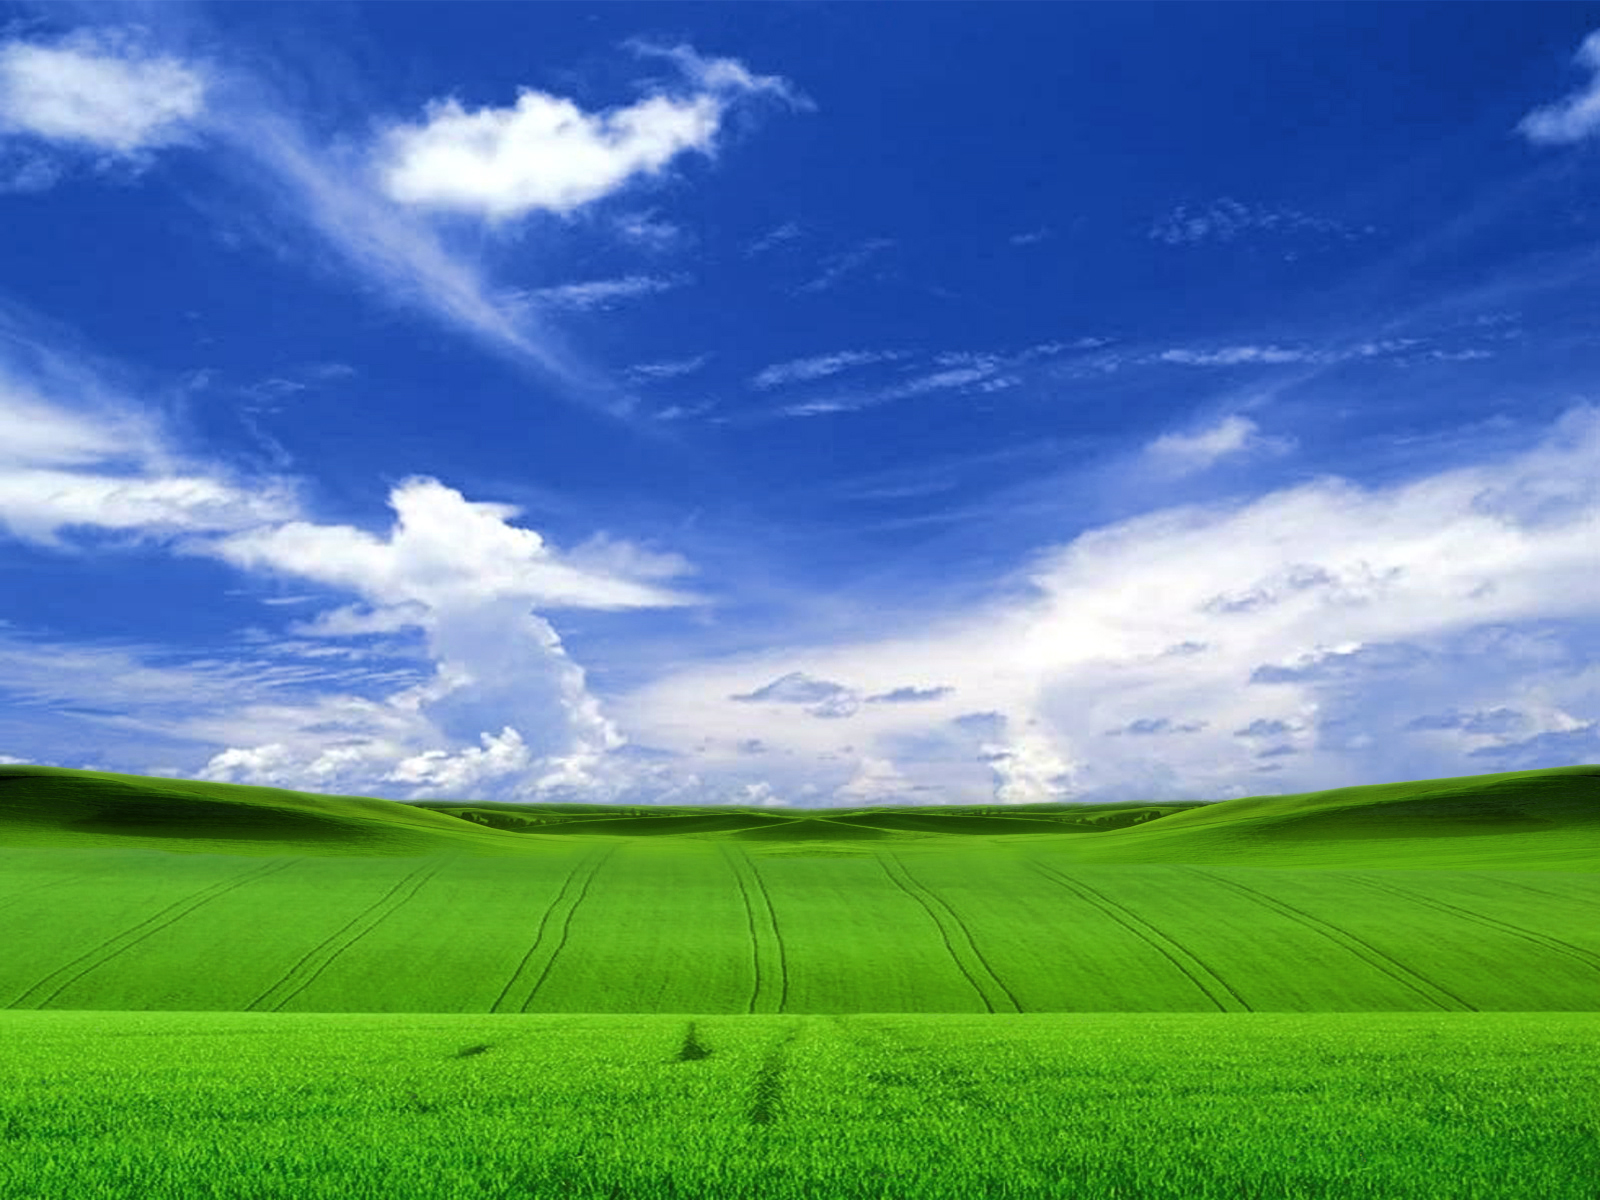 Windows Xp HD Wallpaper Wallpapers